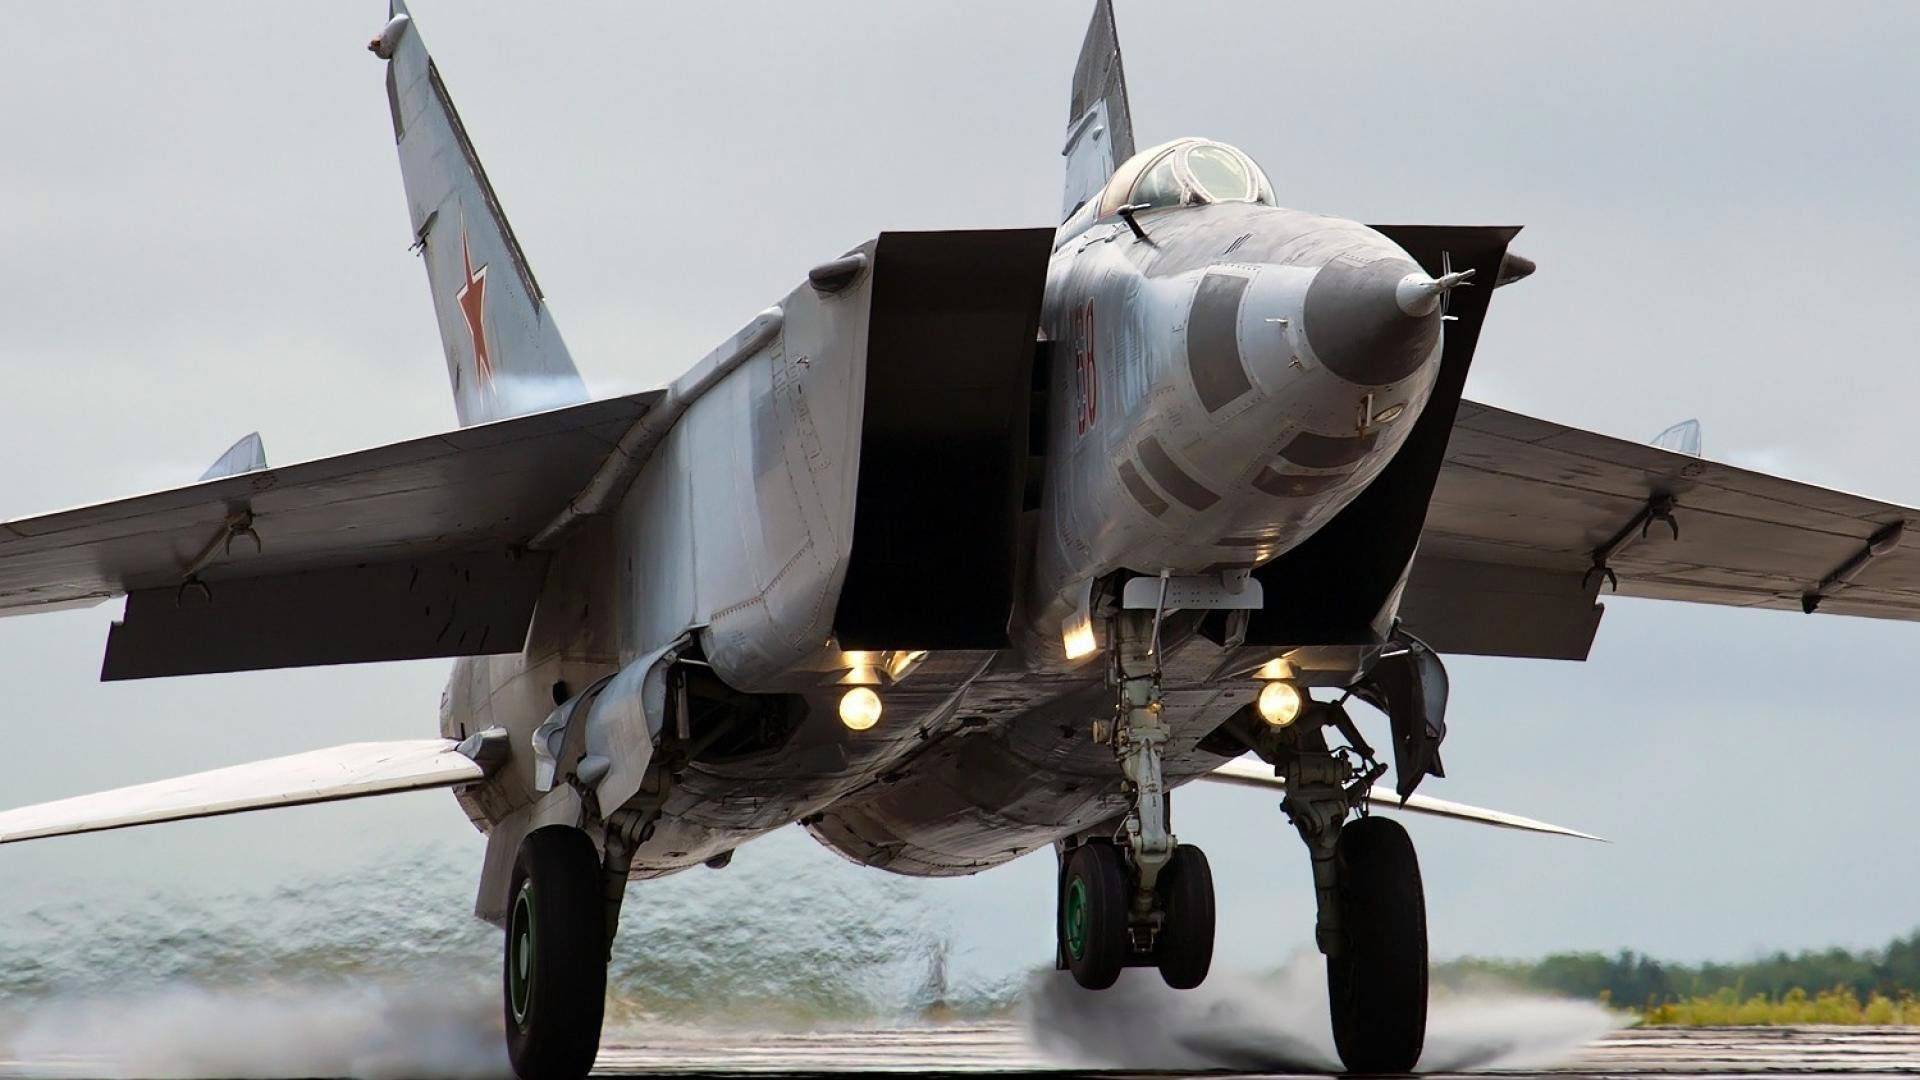 Миг-31. фото. характеристики. история.